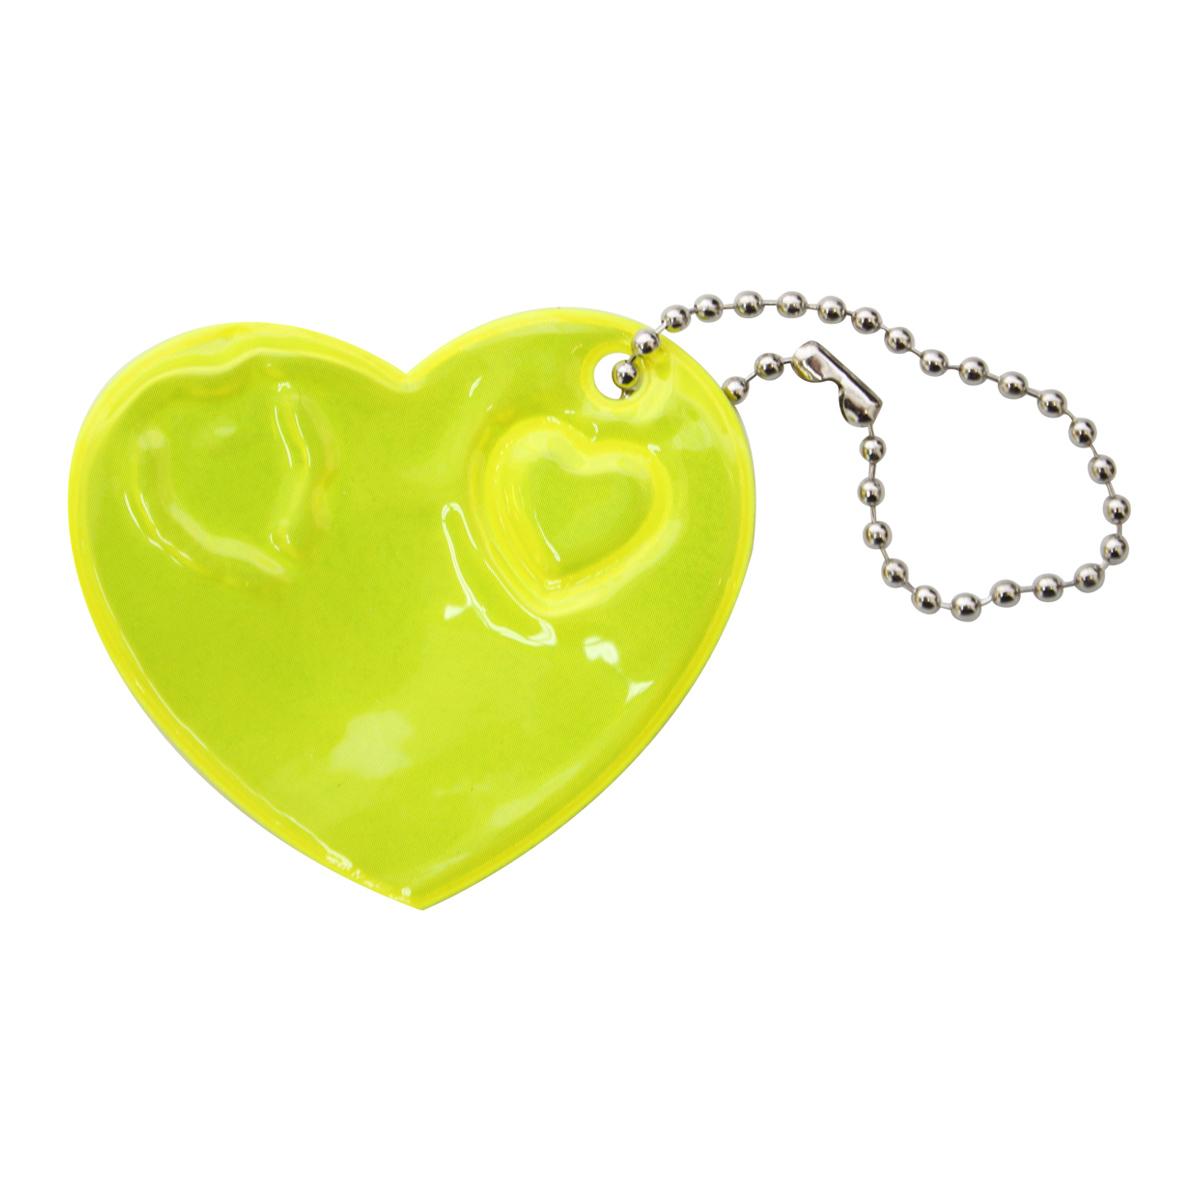 Светоотражающая подвеска 'Сердце', 6 см, упак./2 шт.